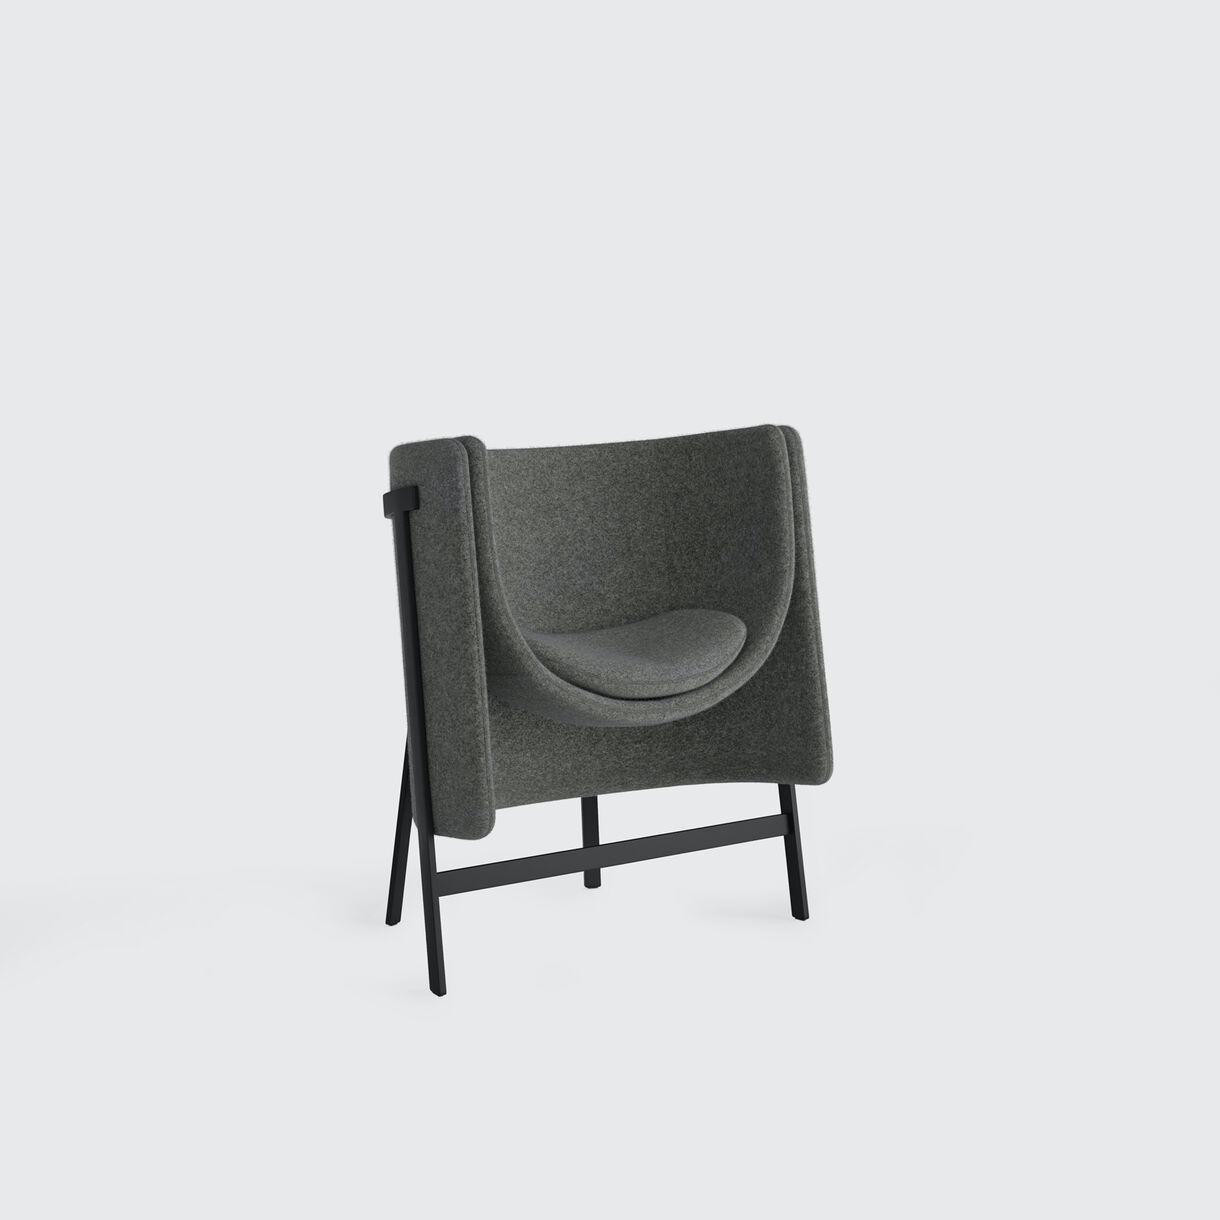 Kite Lounge Chair, Narrow